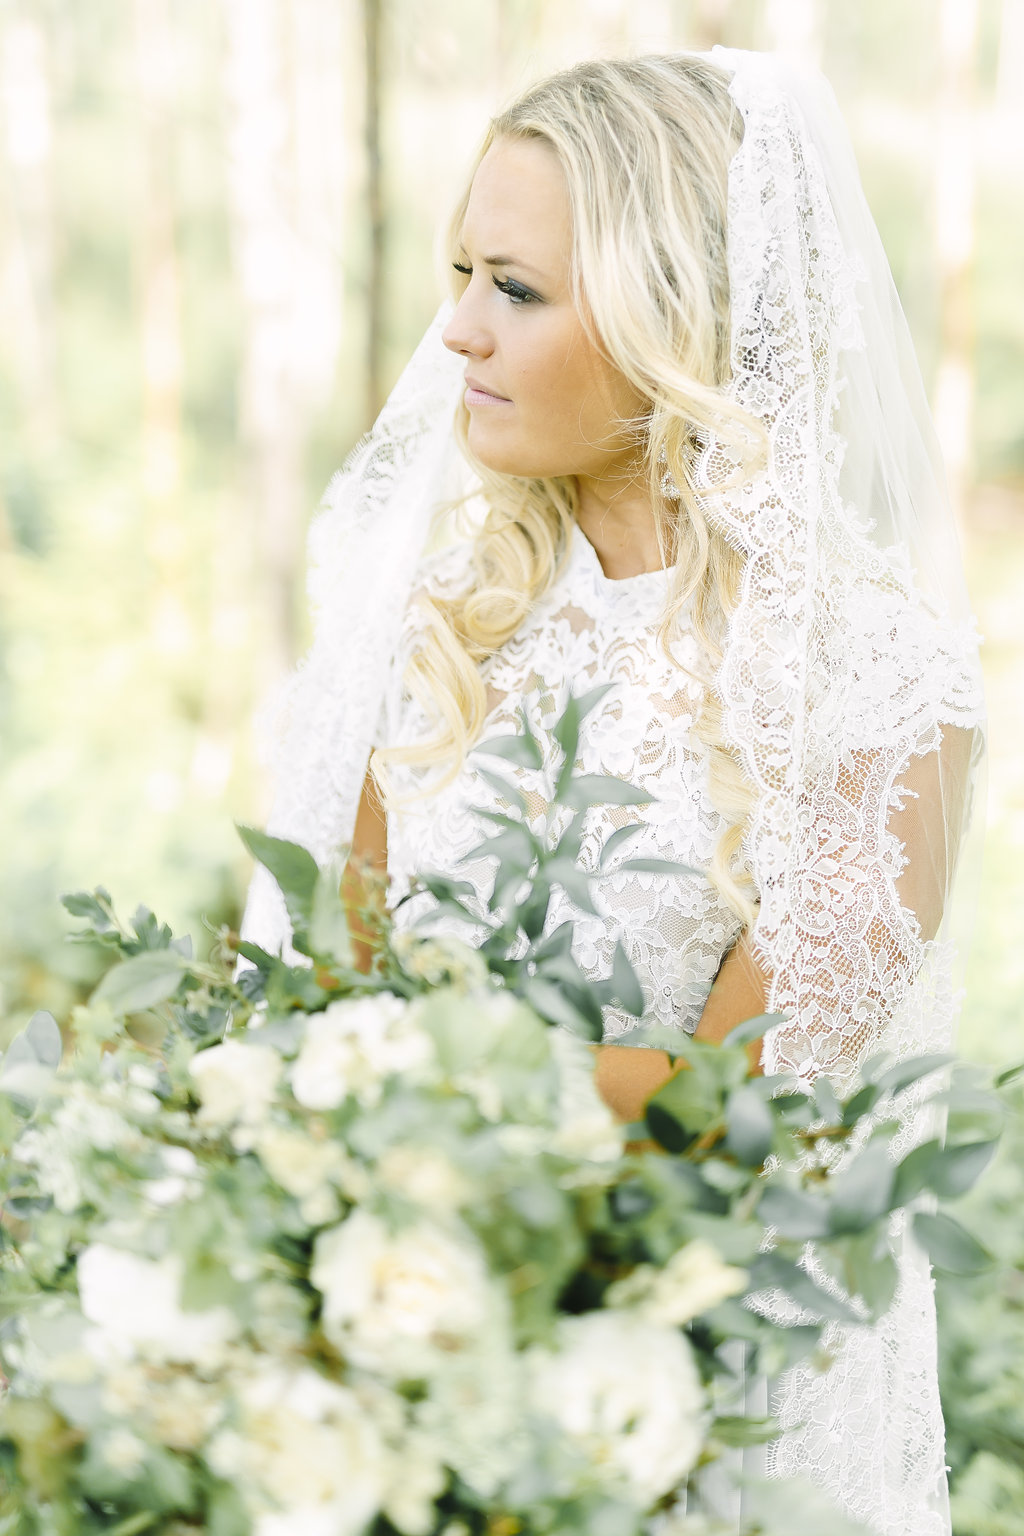 linda-pauline-pehrsdotter-bröllop